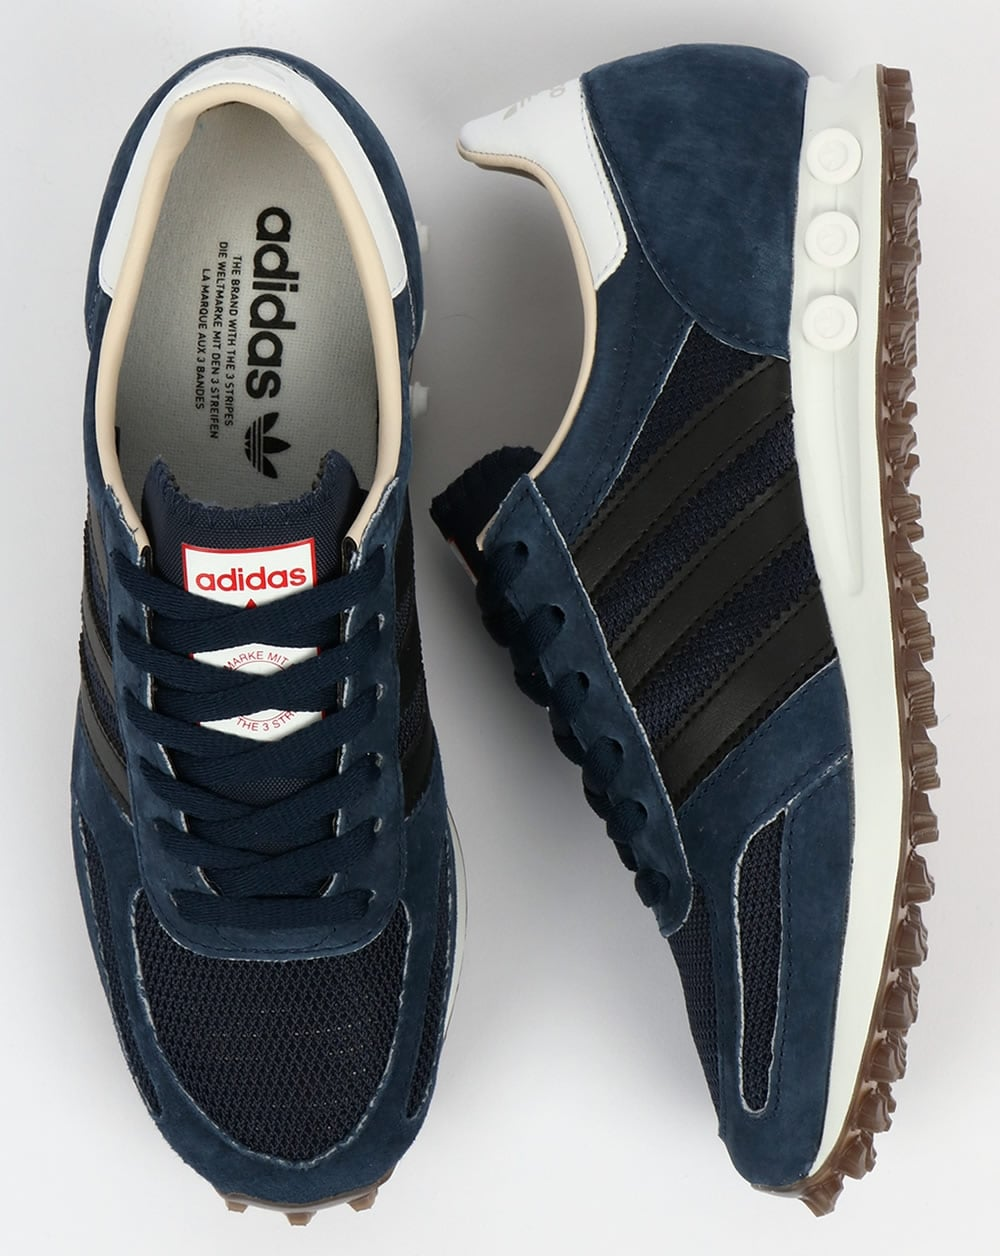 047a0fddc2 Adidas LA Trainer OG Navy Black